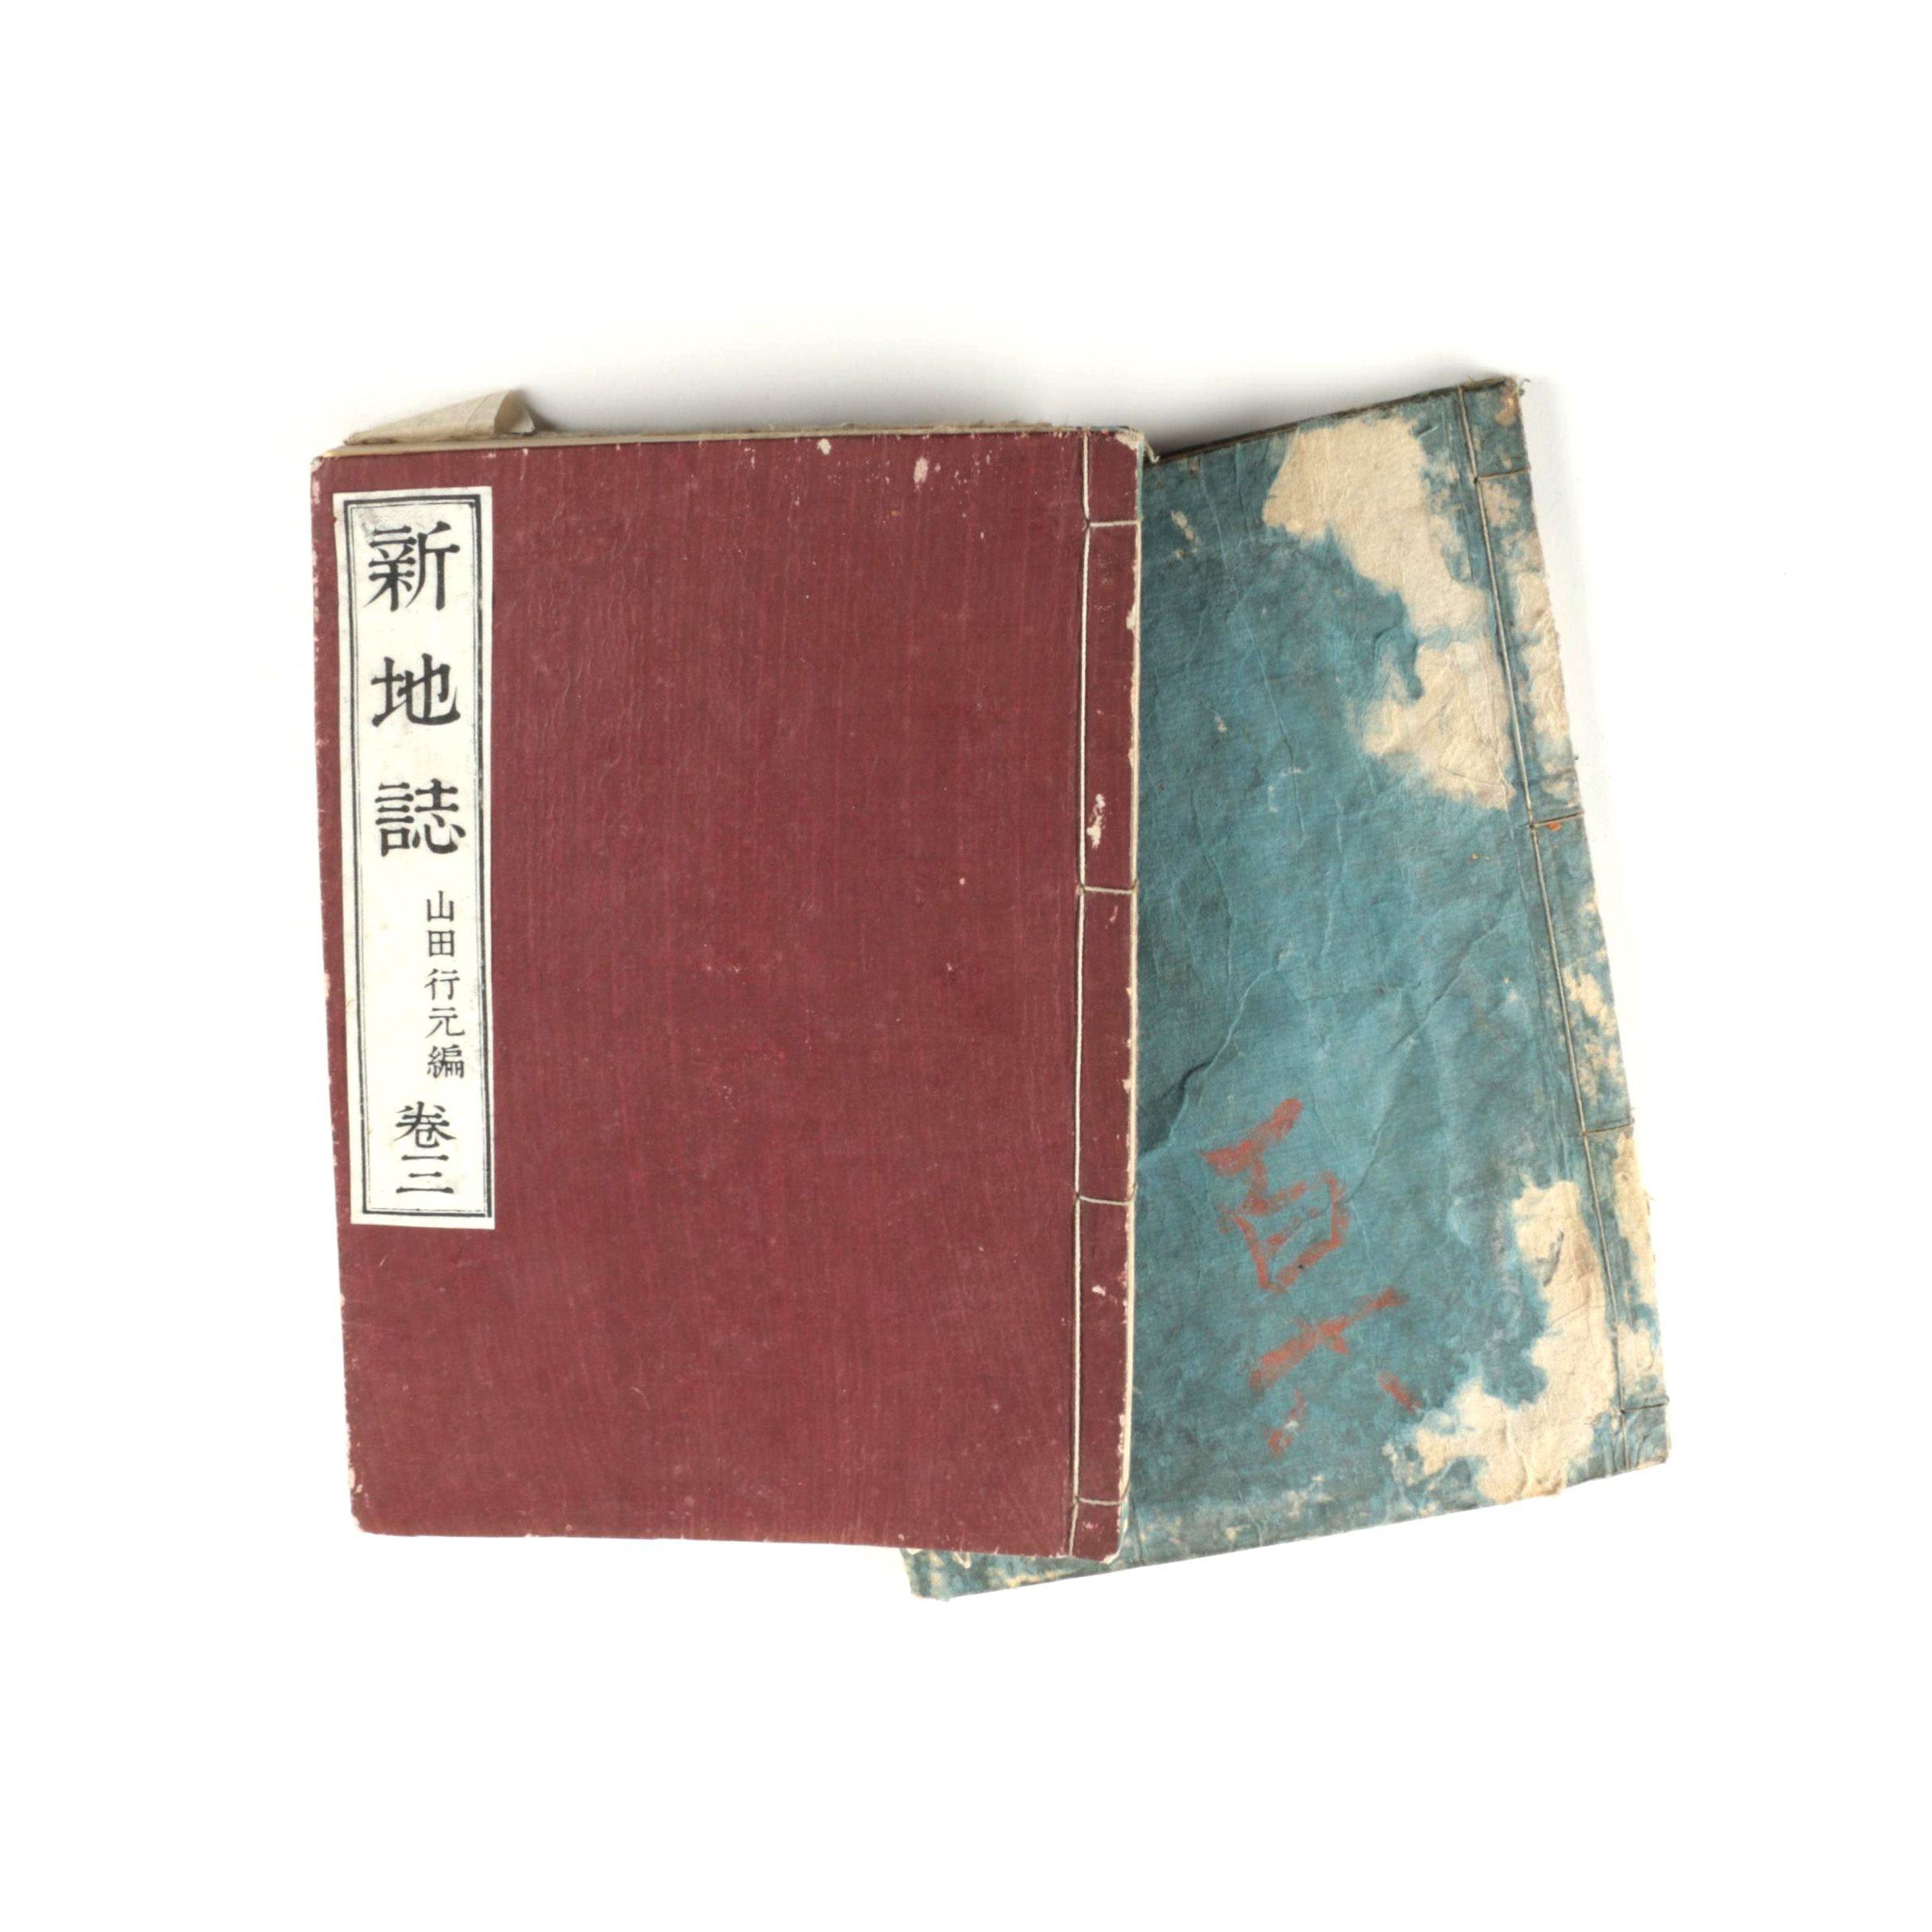 Meiji Era Japanese Geography Textbooks